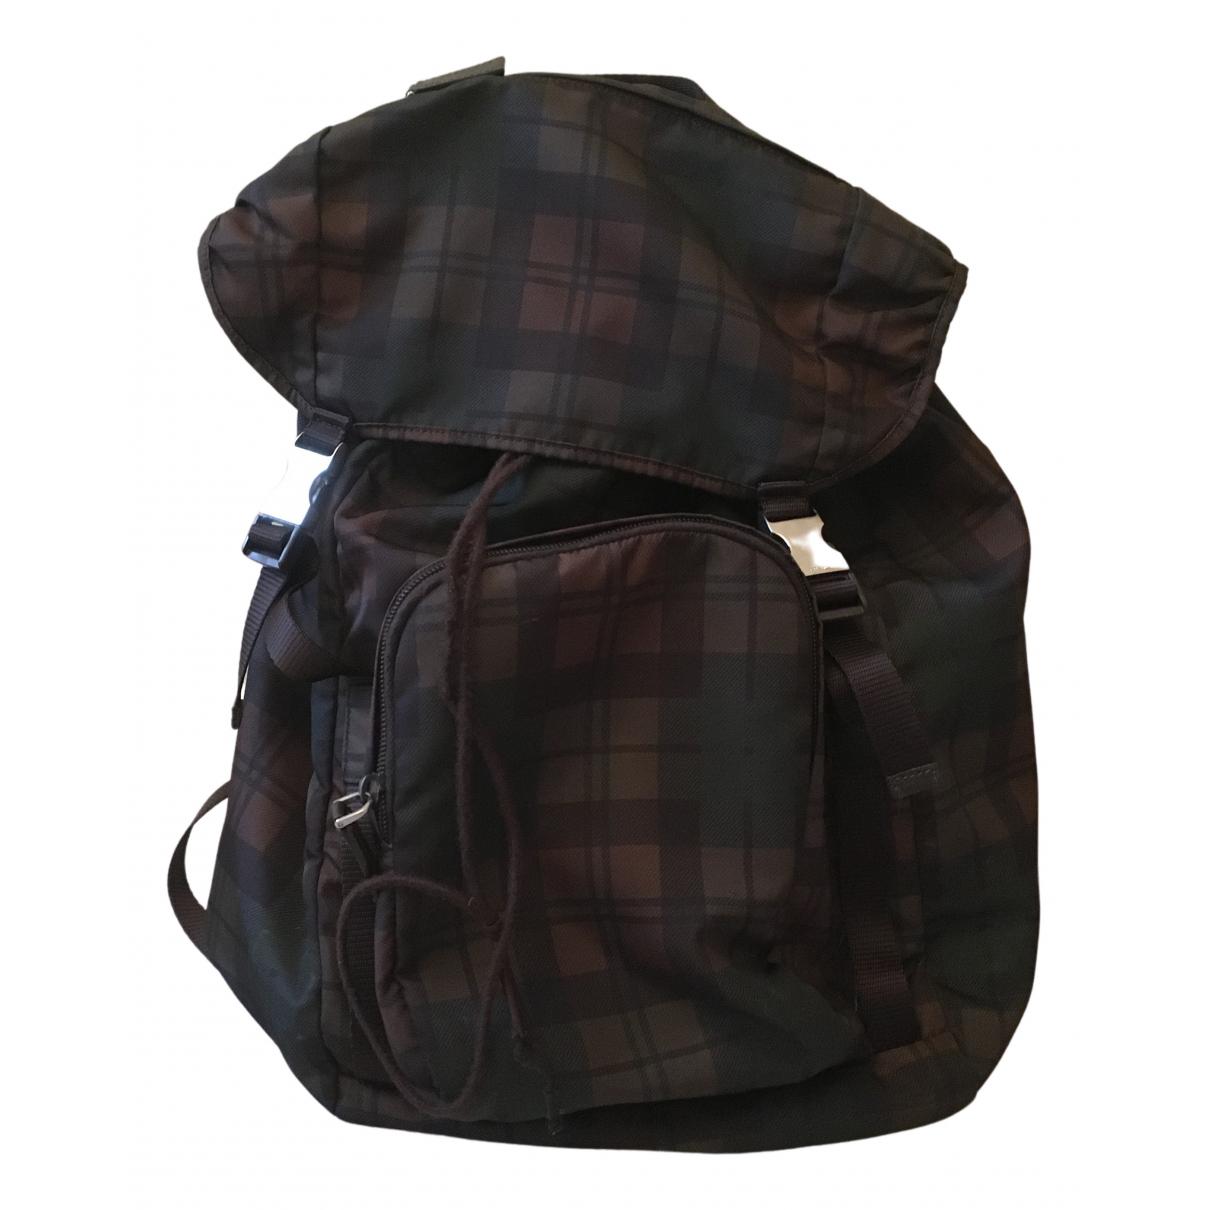 Prada N Brown Leather bag for Men N